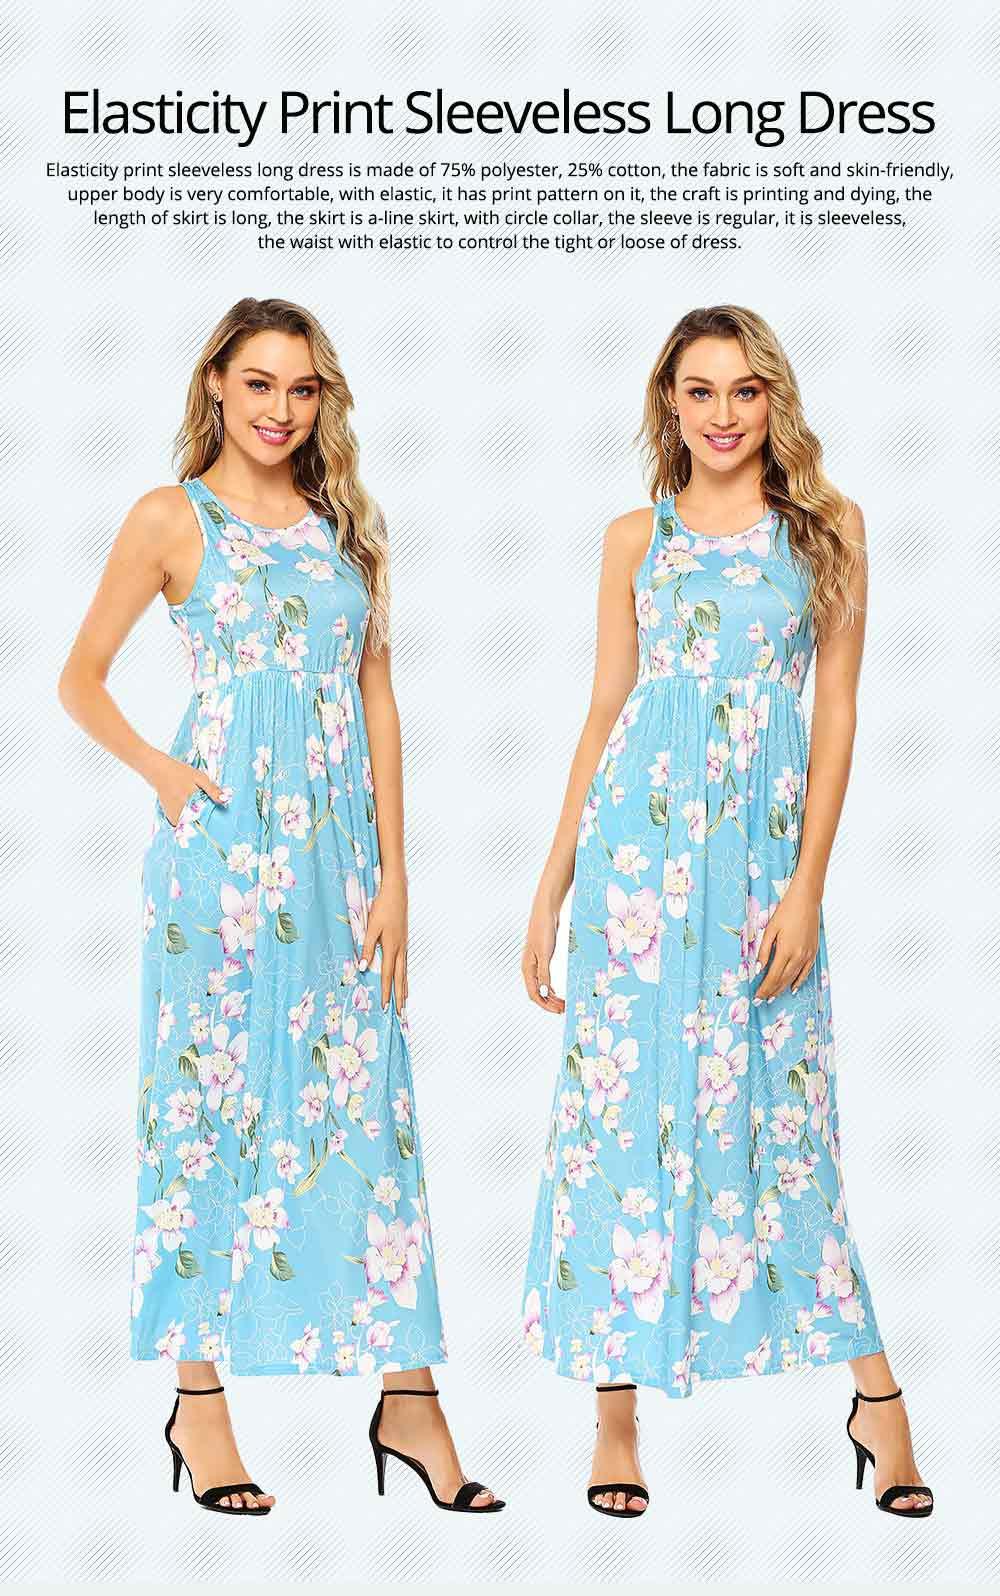 Slim Elegant Long Skirt Summer Elasticity High Waist Women's Flower Print Sleeveless Dress With Pockets Beach Dresses For Ladies 0